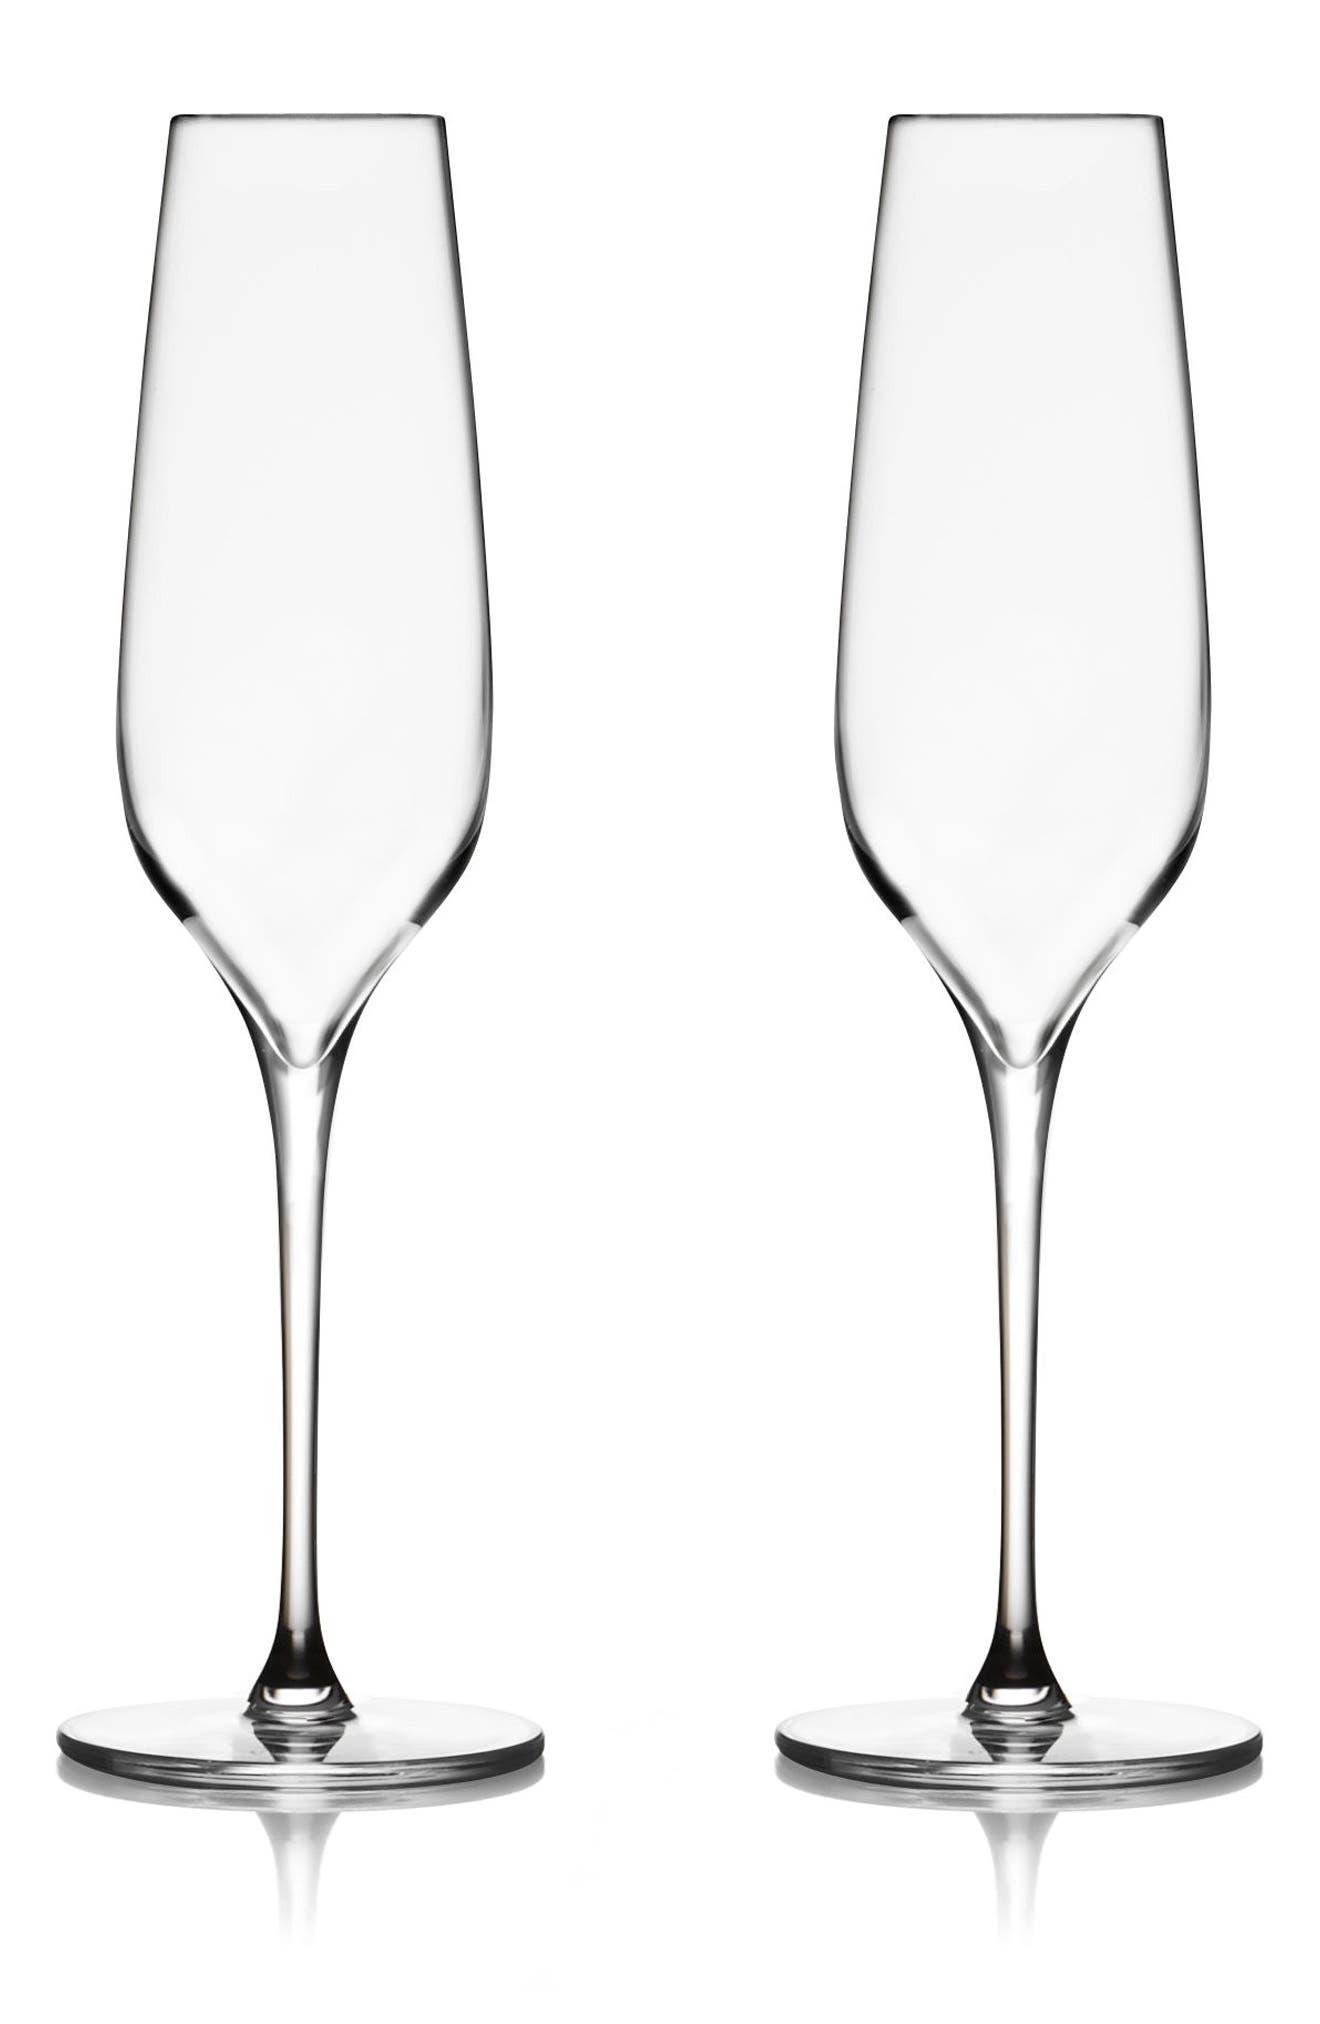 Vie Set of 2 Champagne Flutes,                             Main thumbnail 1, color,                             Clear